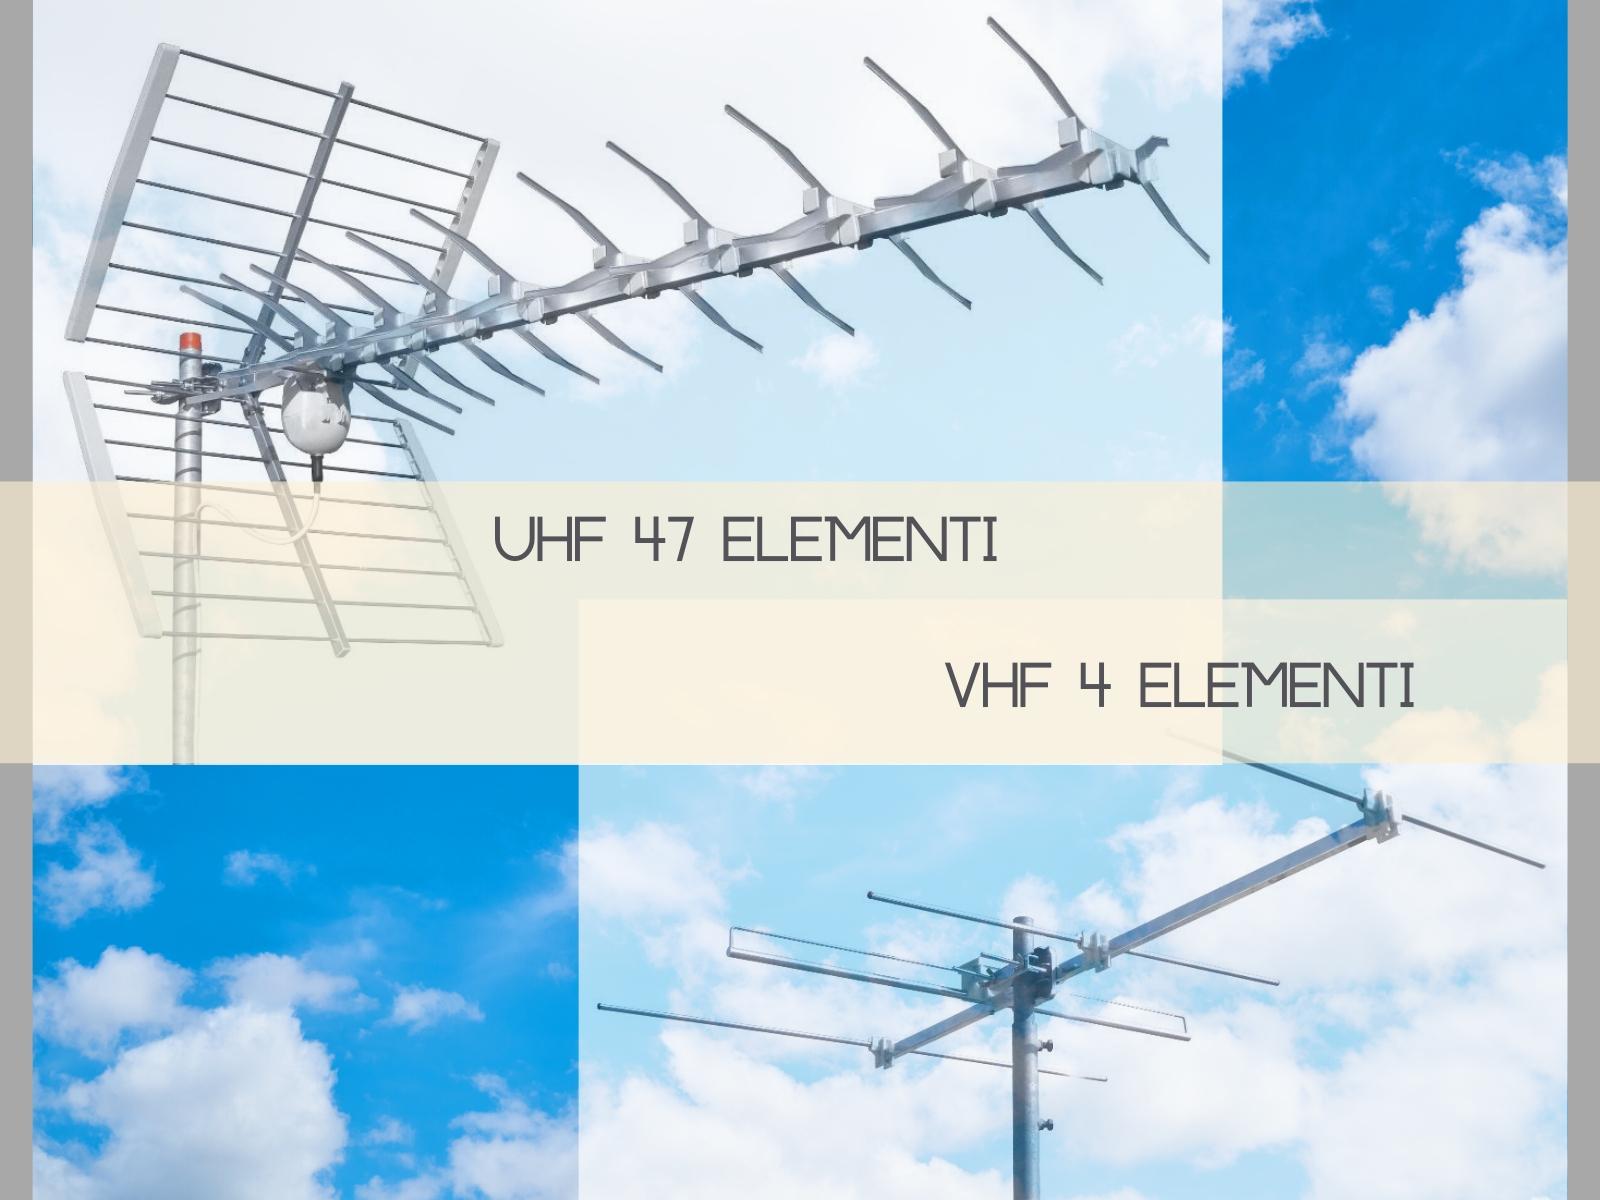 Impianto VHf + Uhf digitale terrestre